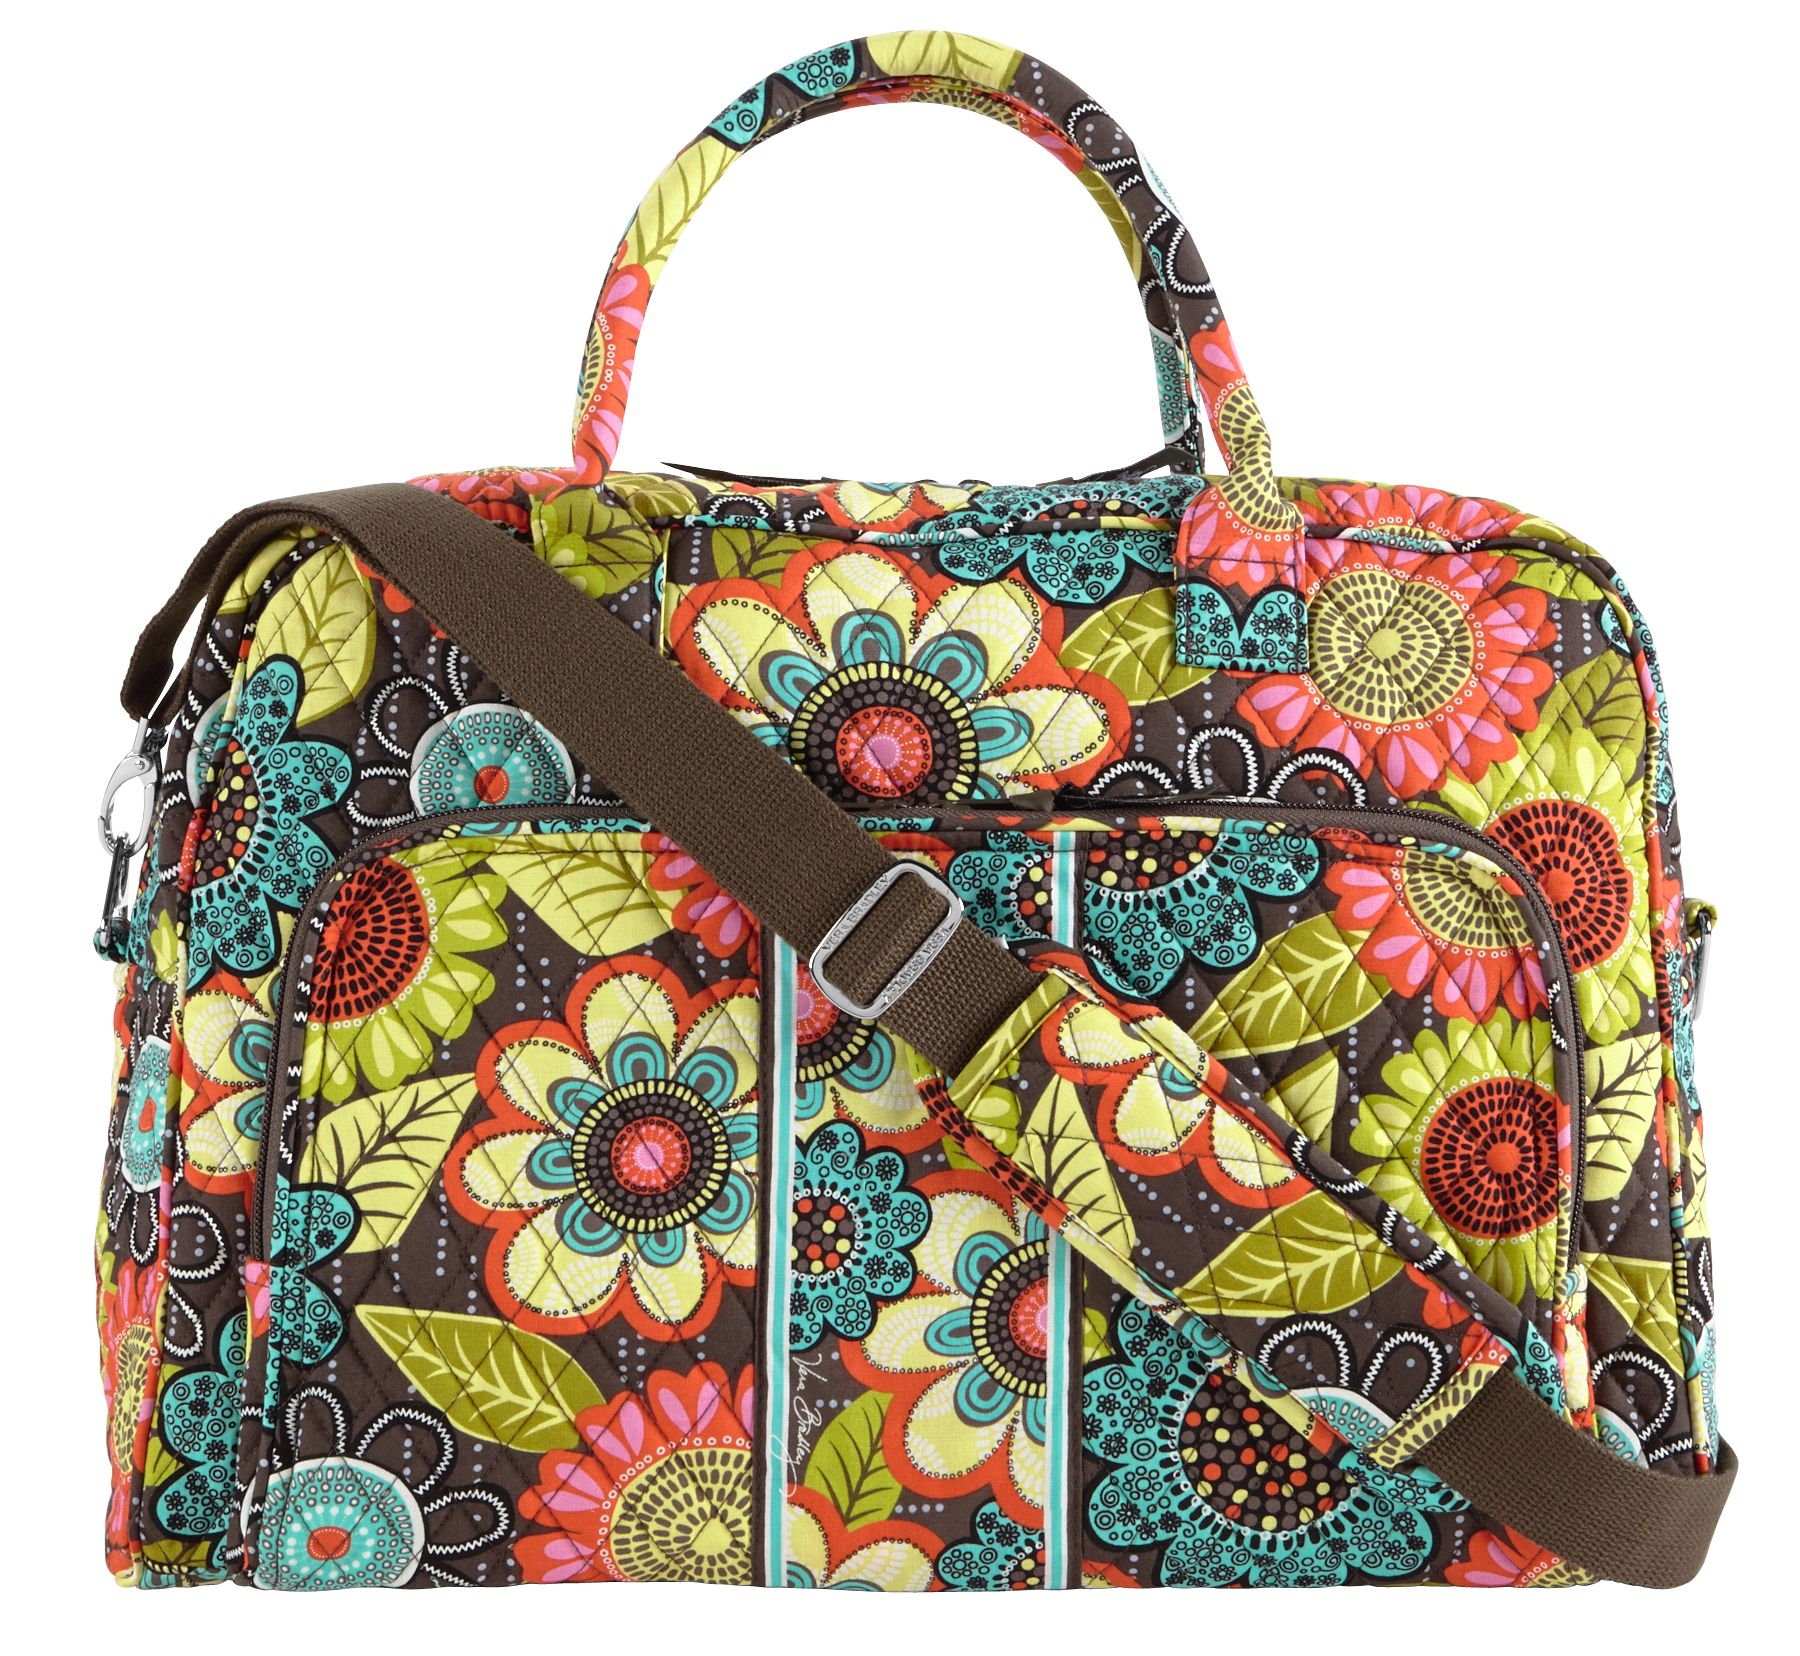 Vera bradley extra 30 off sale for Vera bradley bathroom bag